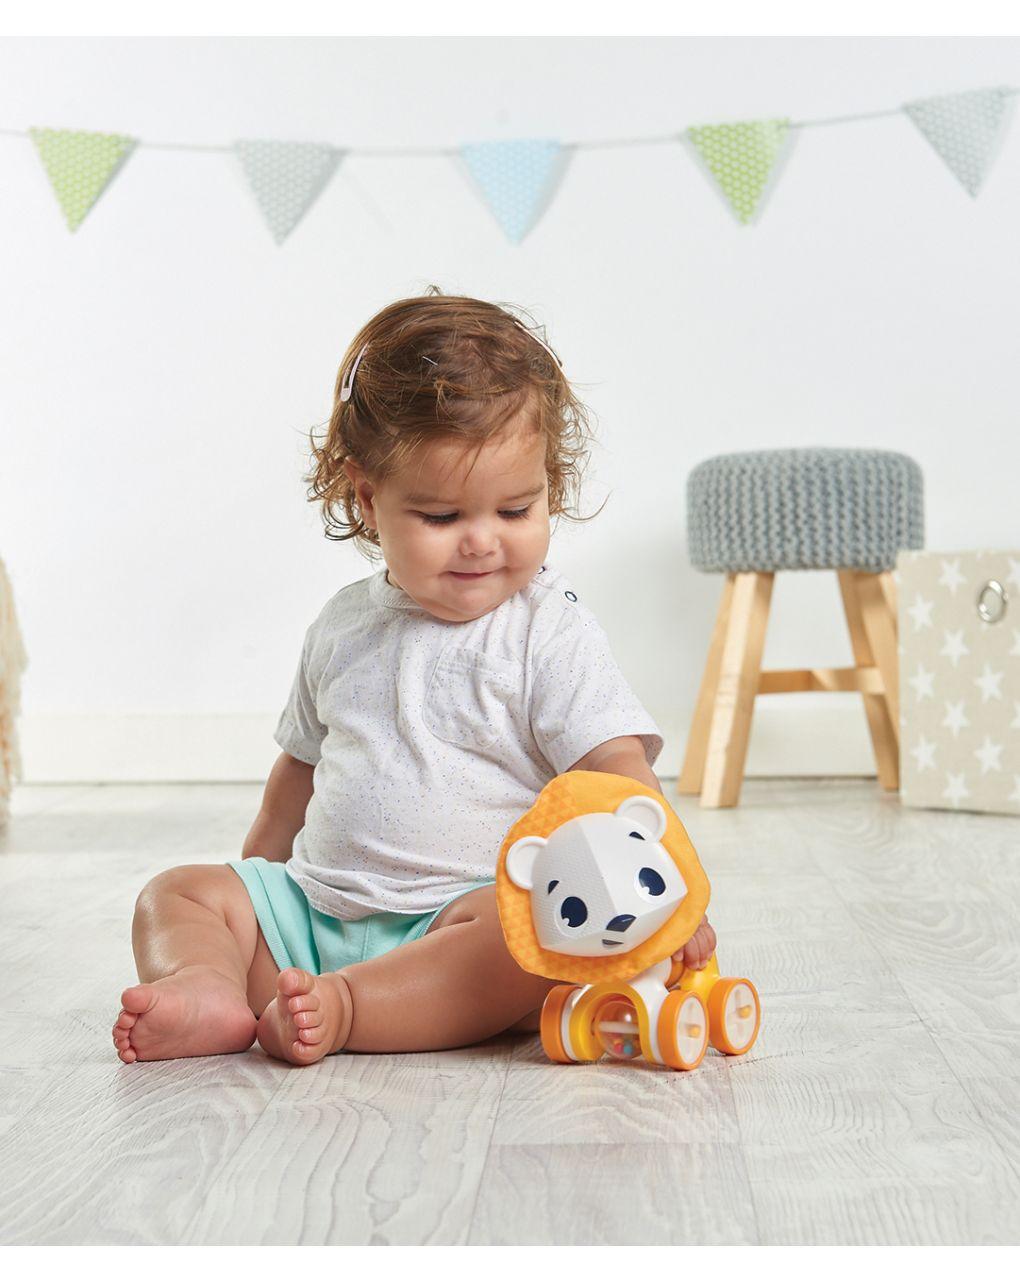 Tini love - tiny rolling toys leonardo il leone - Tiny Love